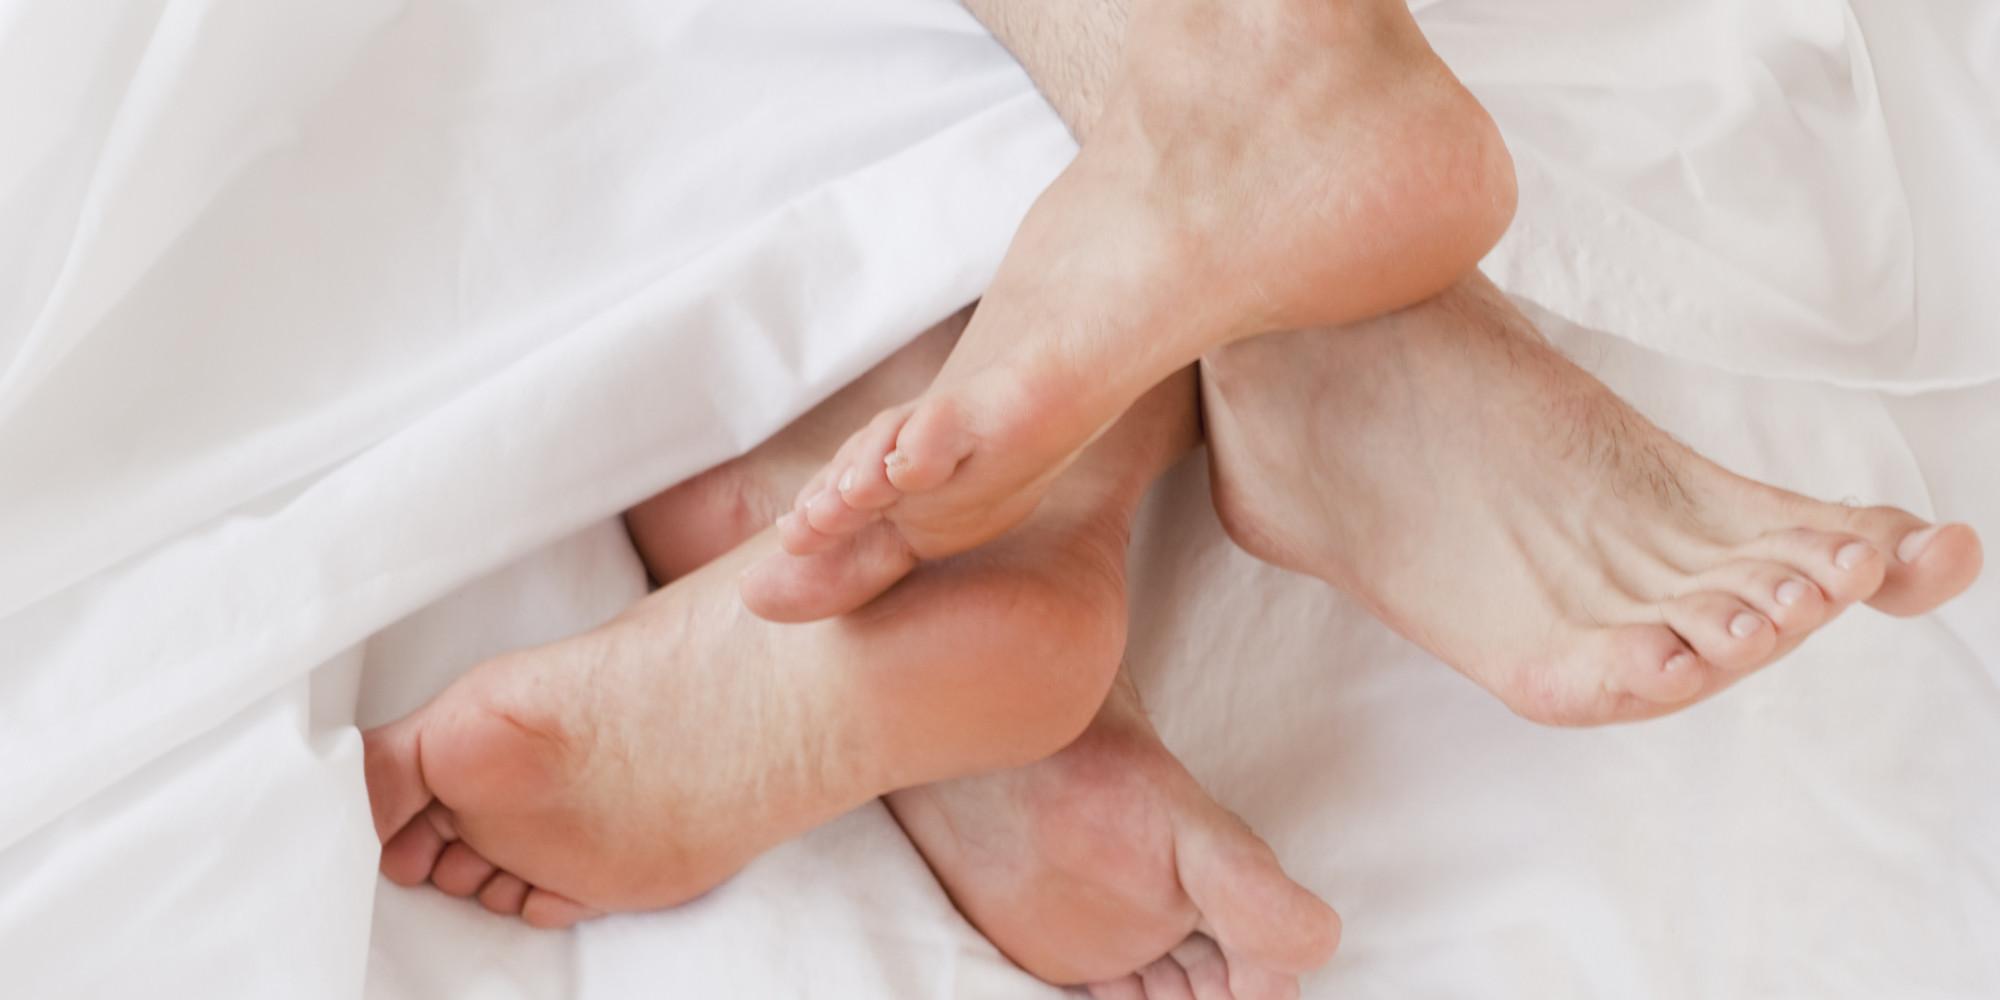 Tranny Massage Sydney